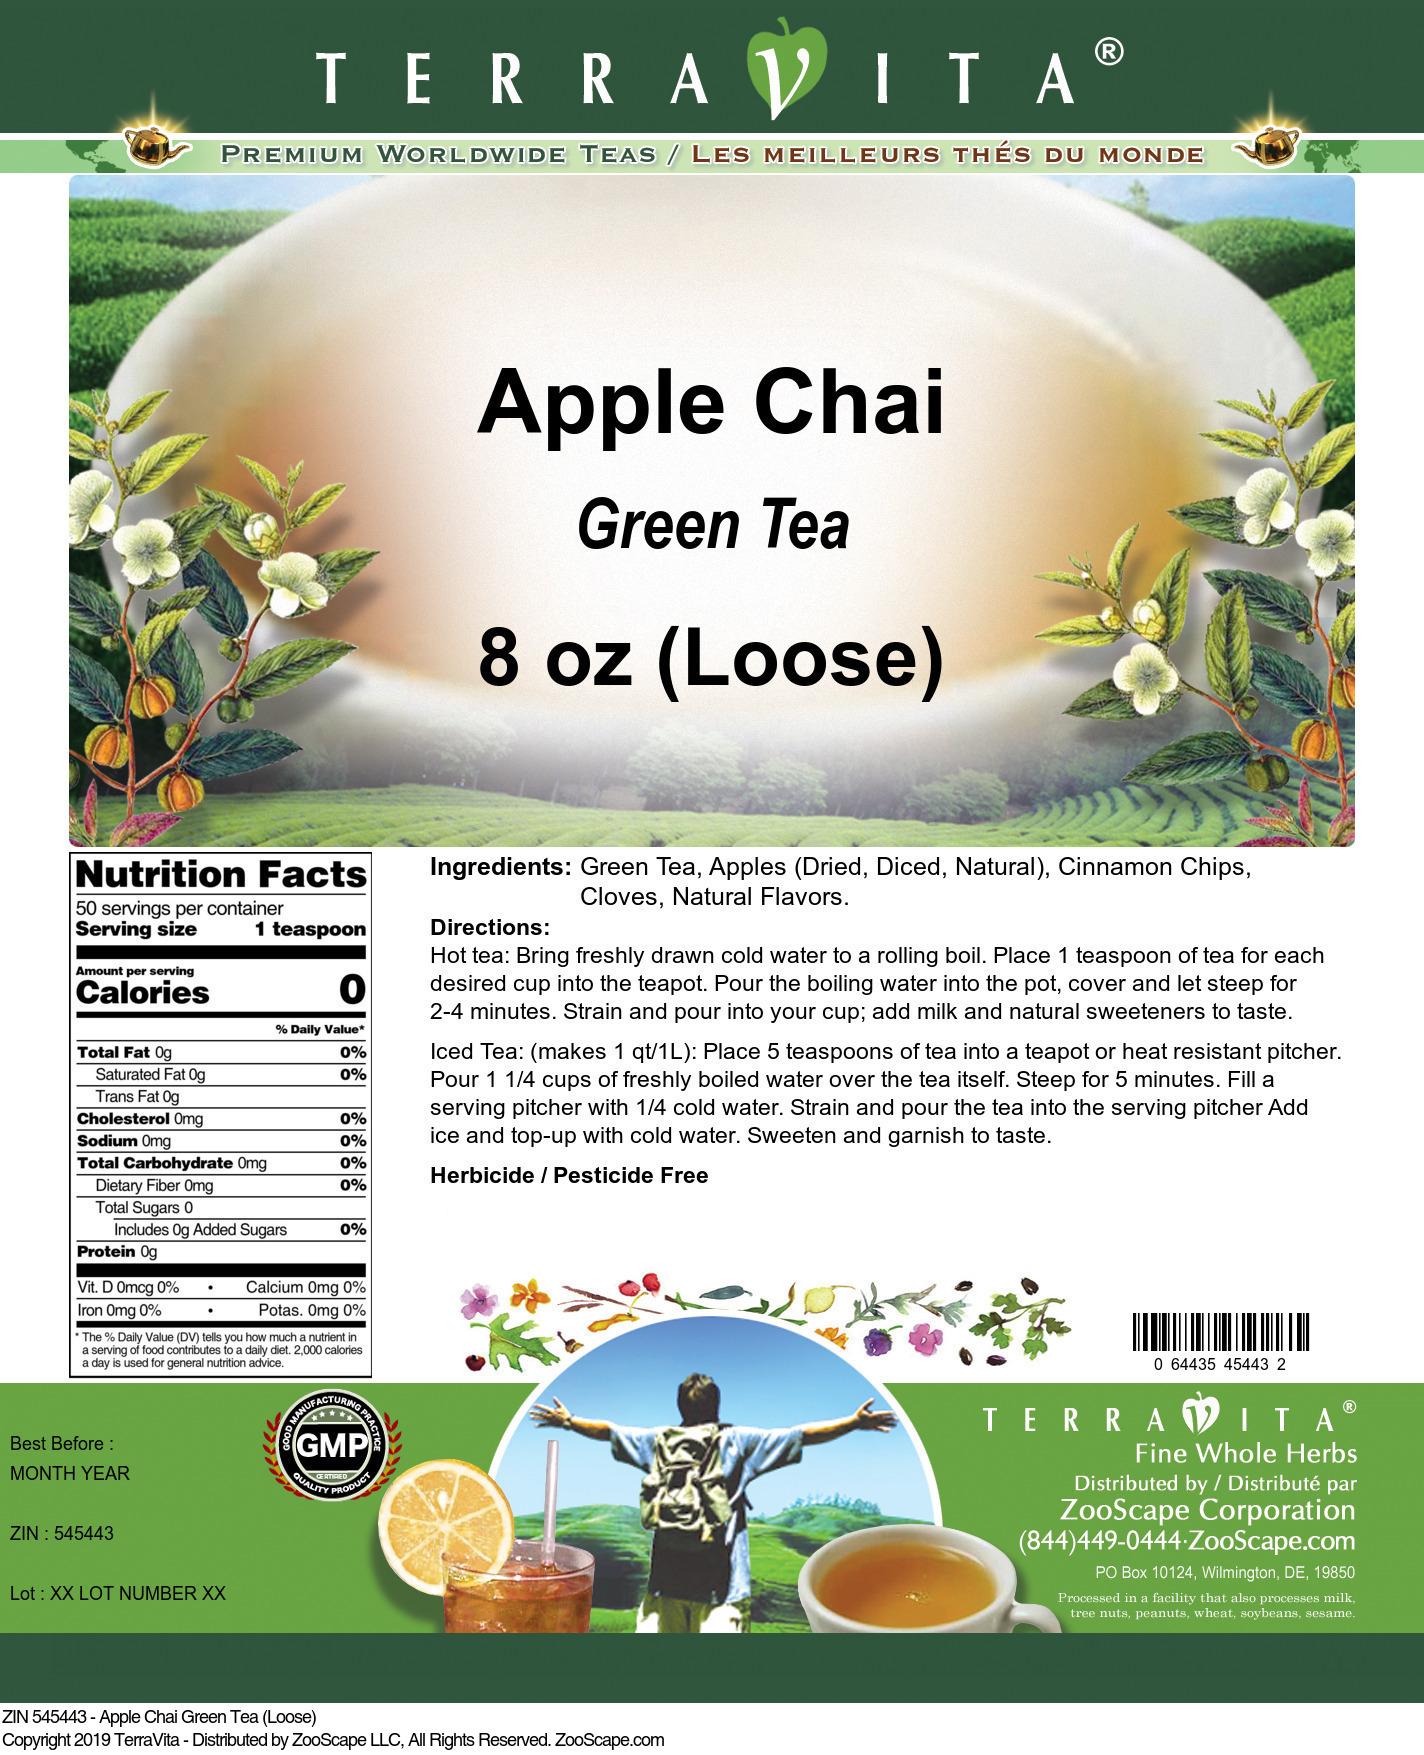 Apple Chai Green Tea